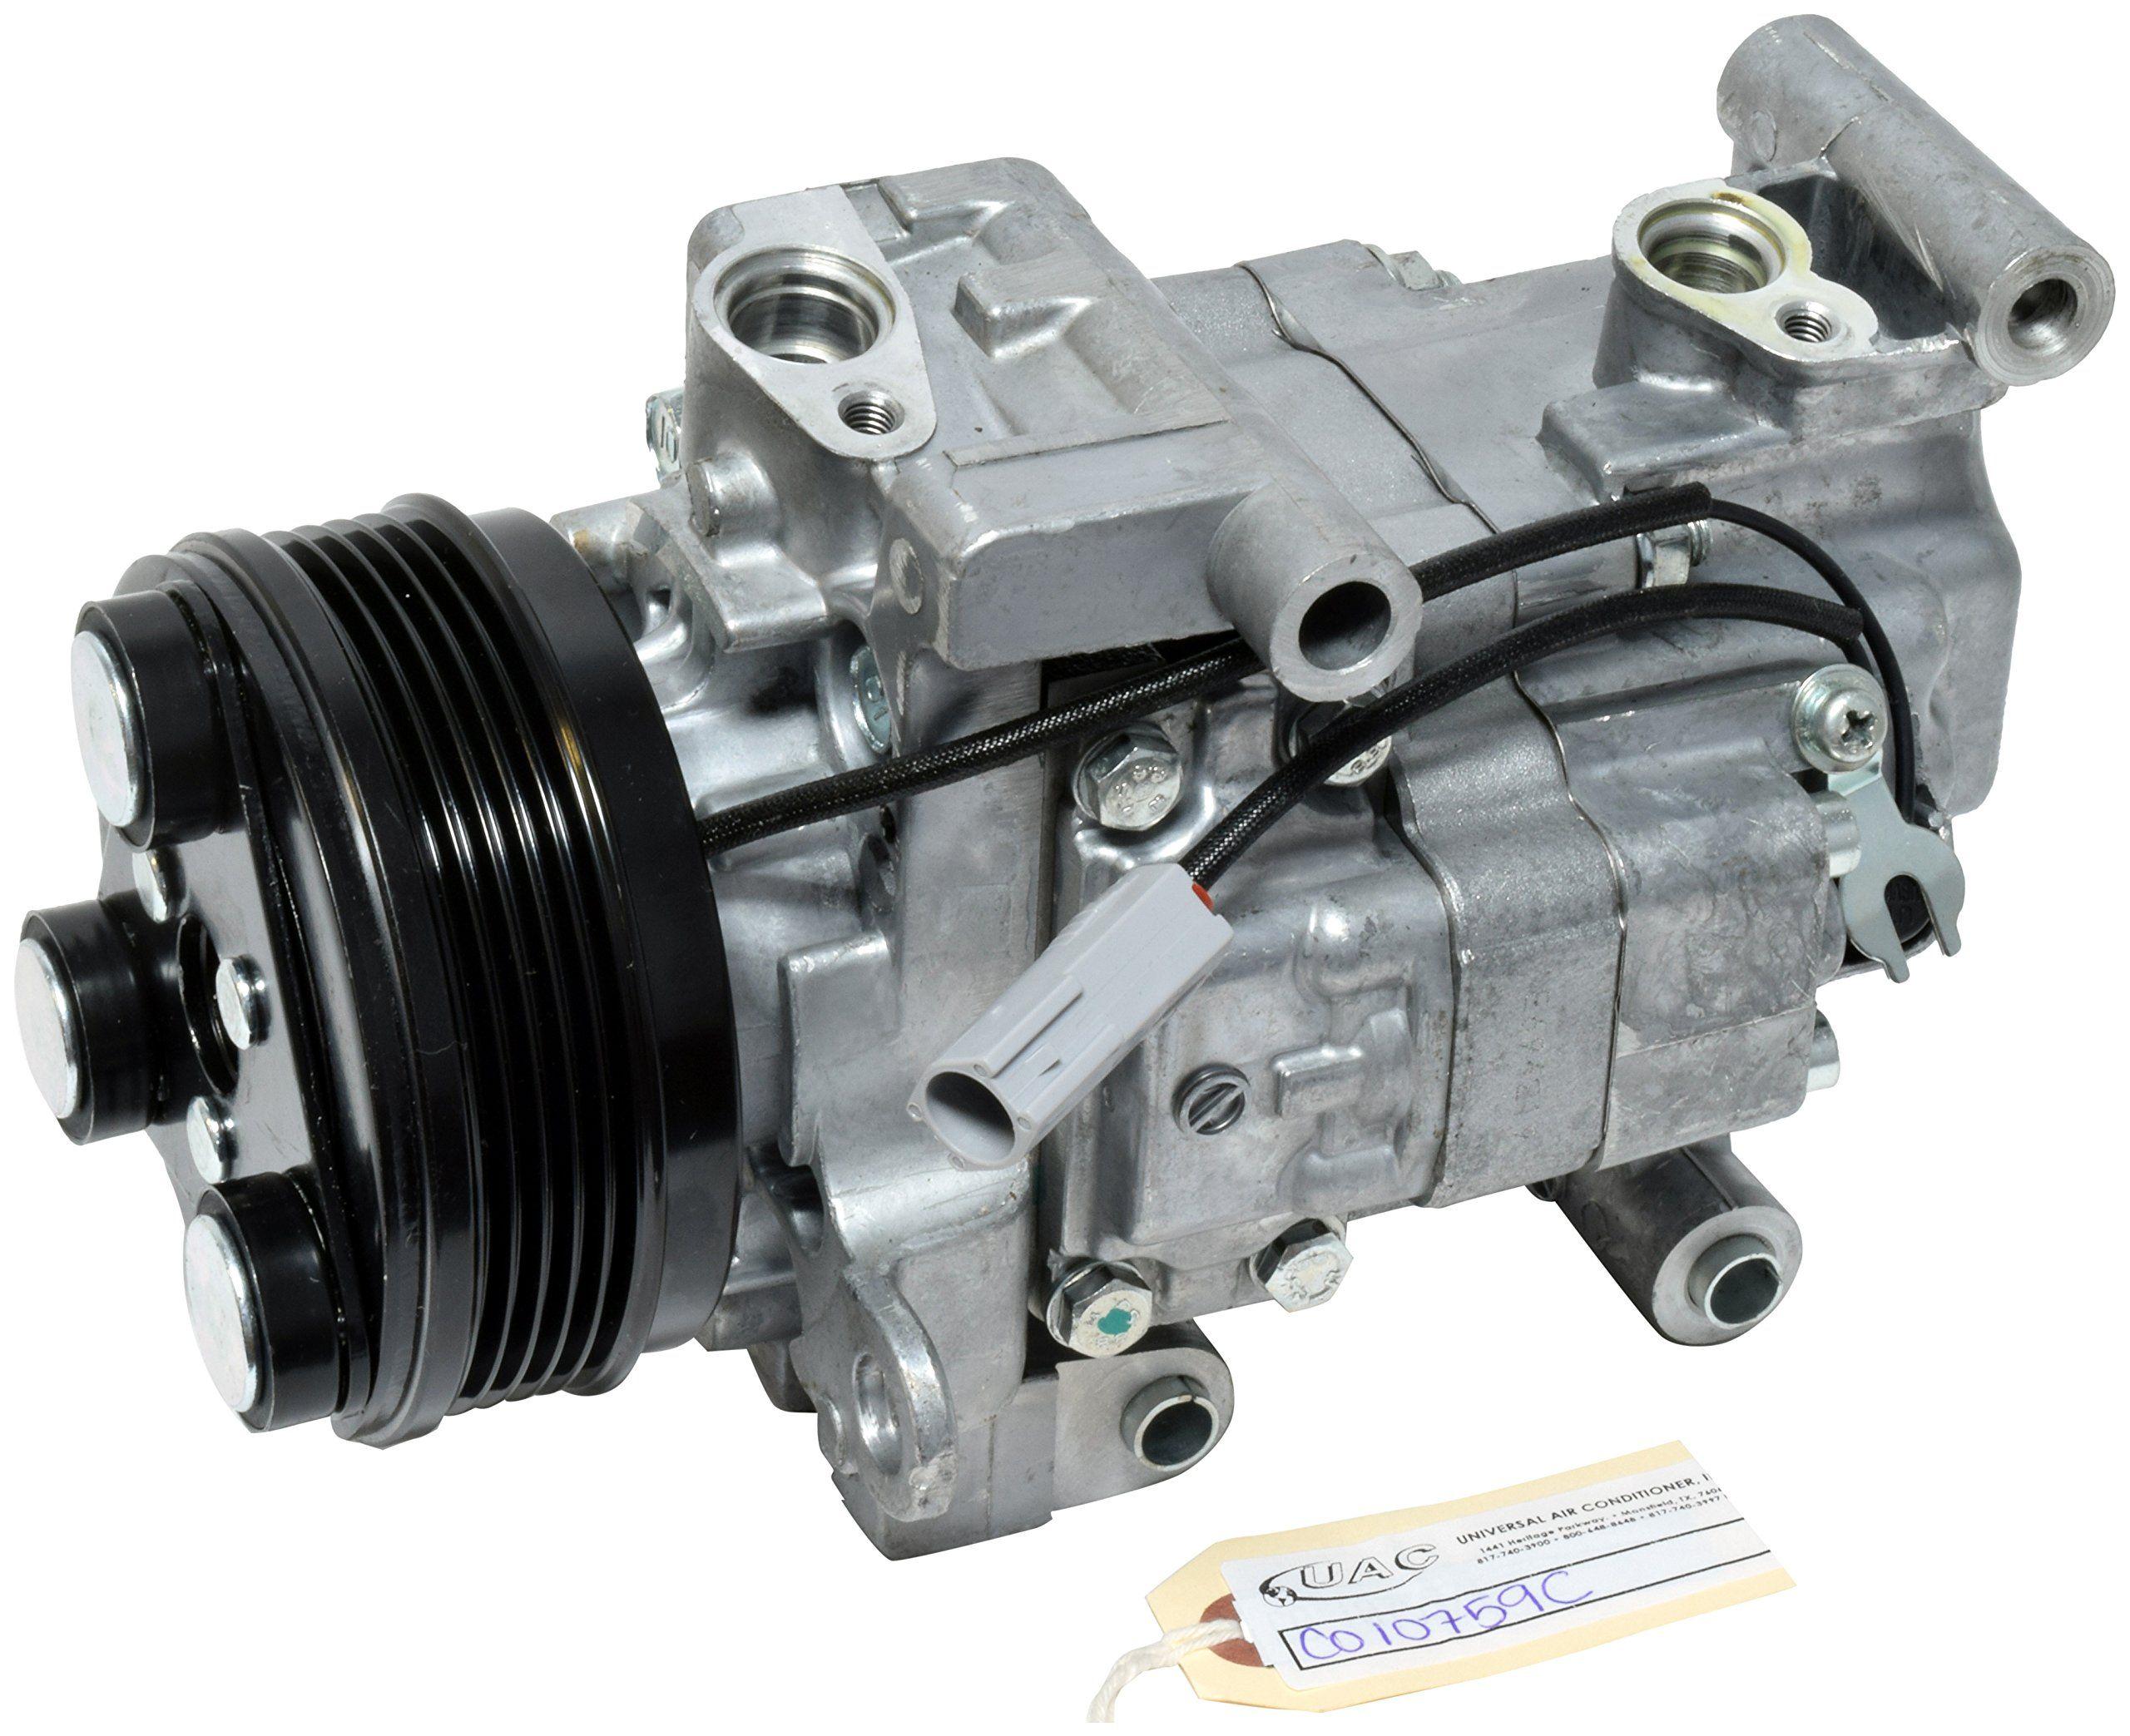 UAC CO 10759C New Compressor, 94 Compressor, Conditioner